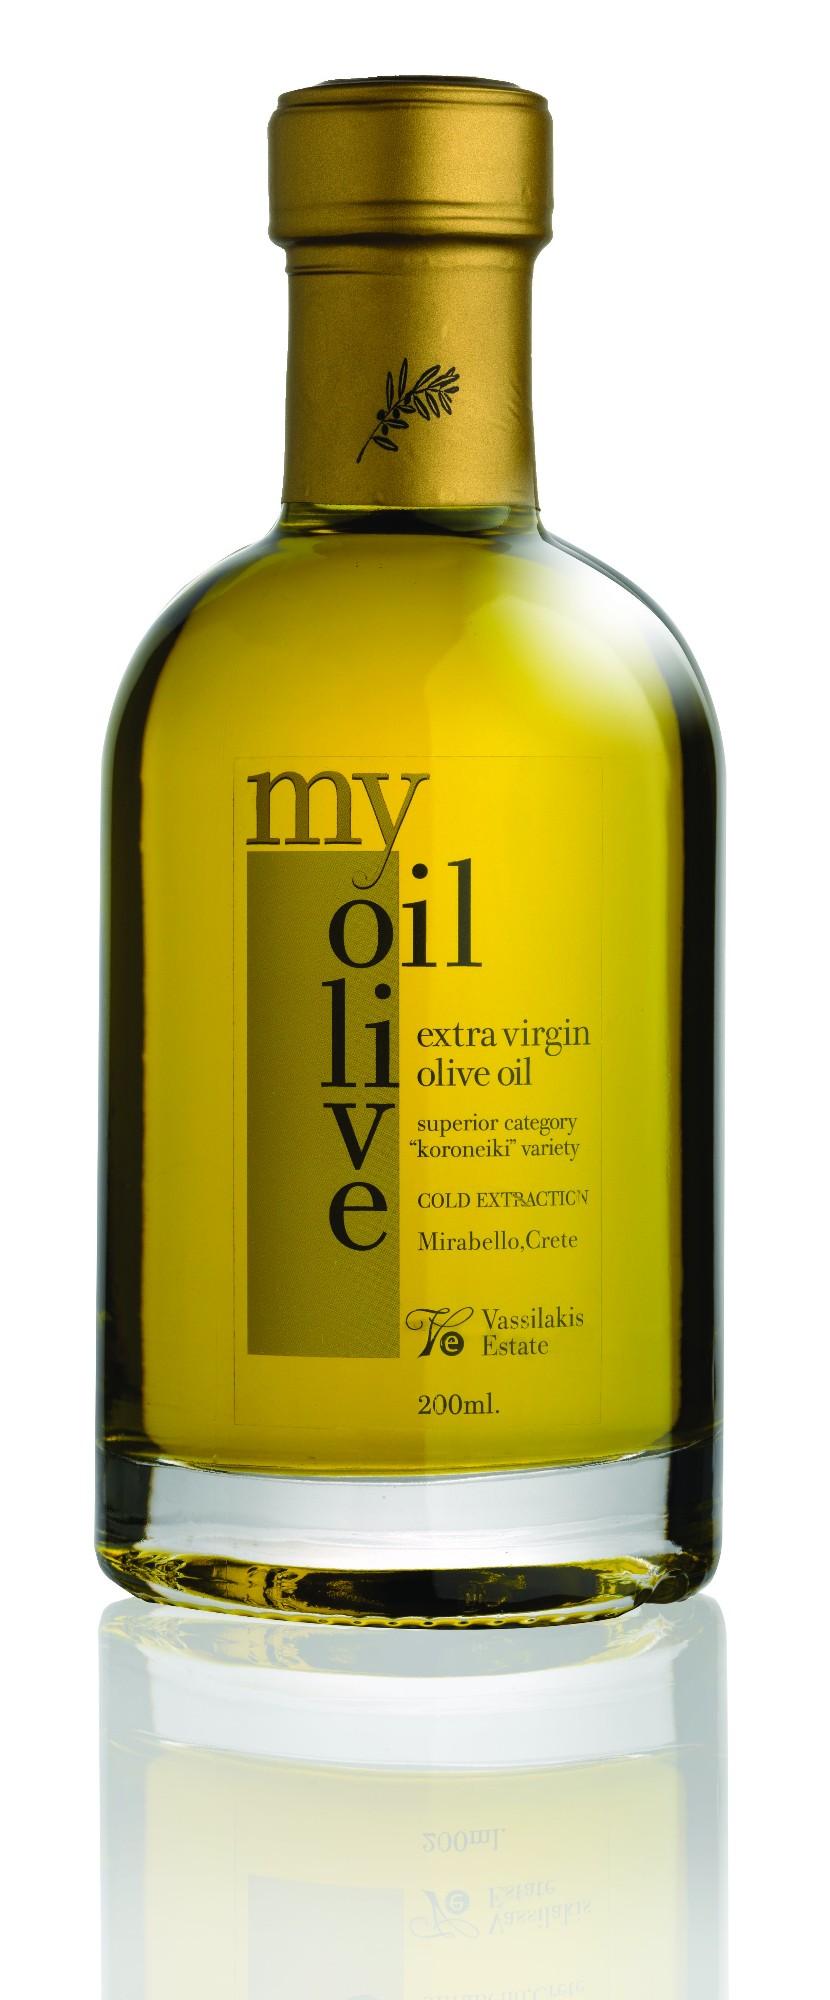 Ypač tyras alyvuogių aliejus MY OLIVE OIL VASSILAKIS ESTATE, 200ml